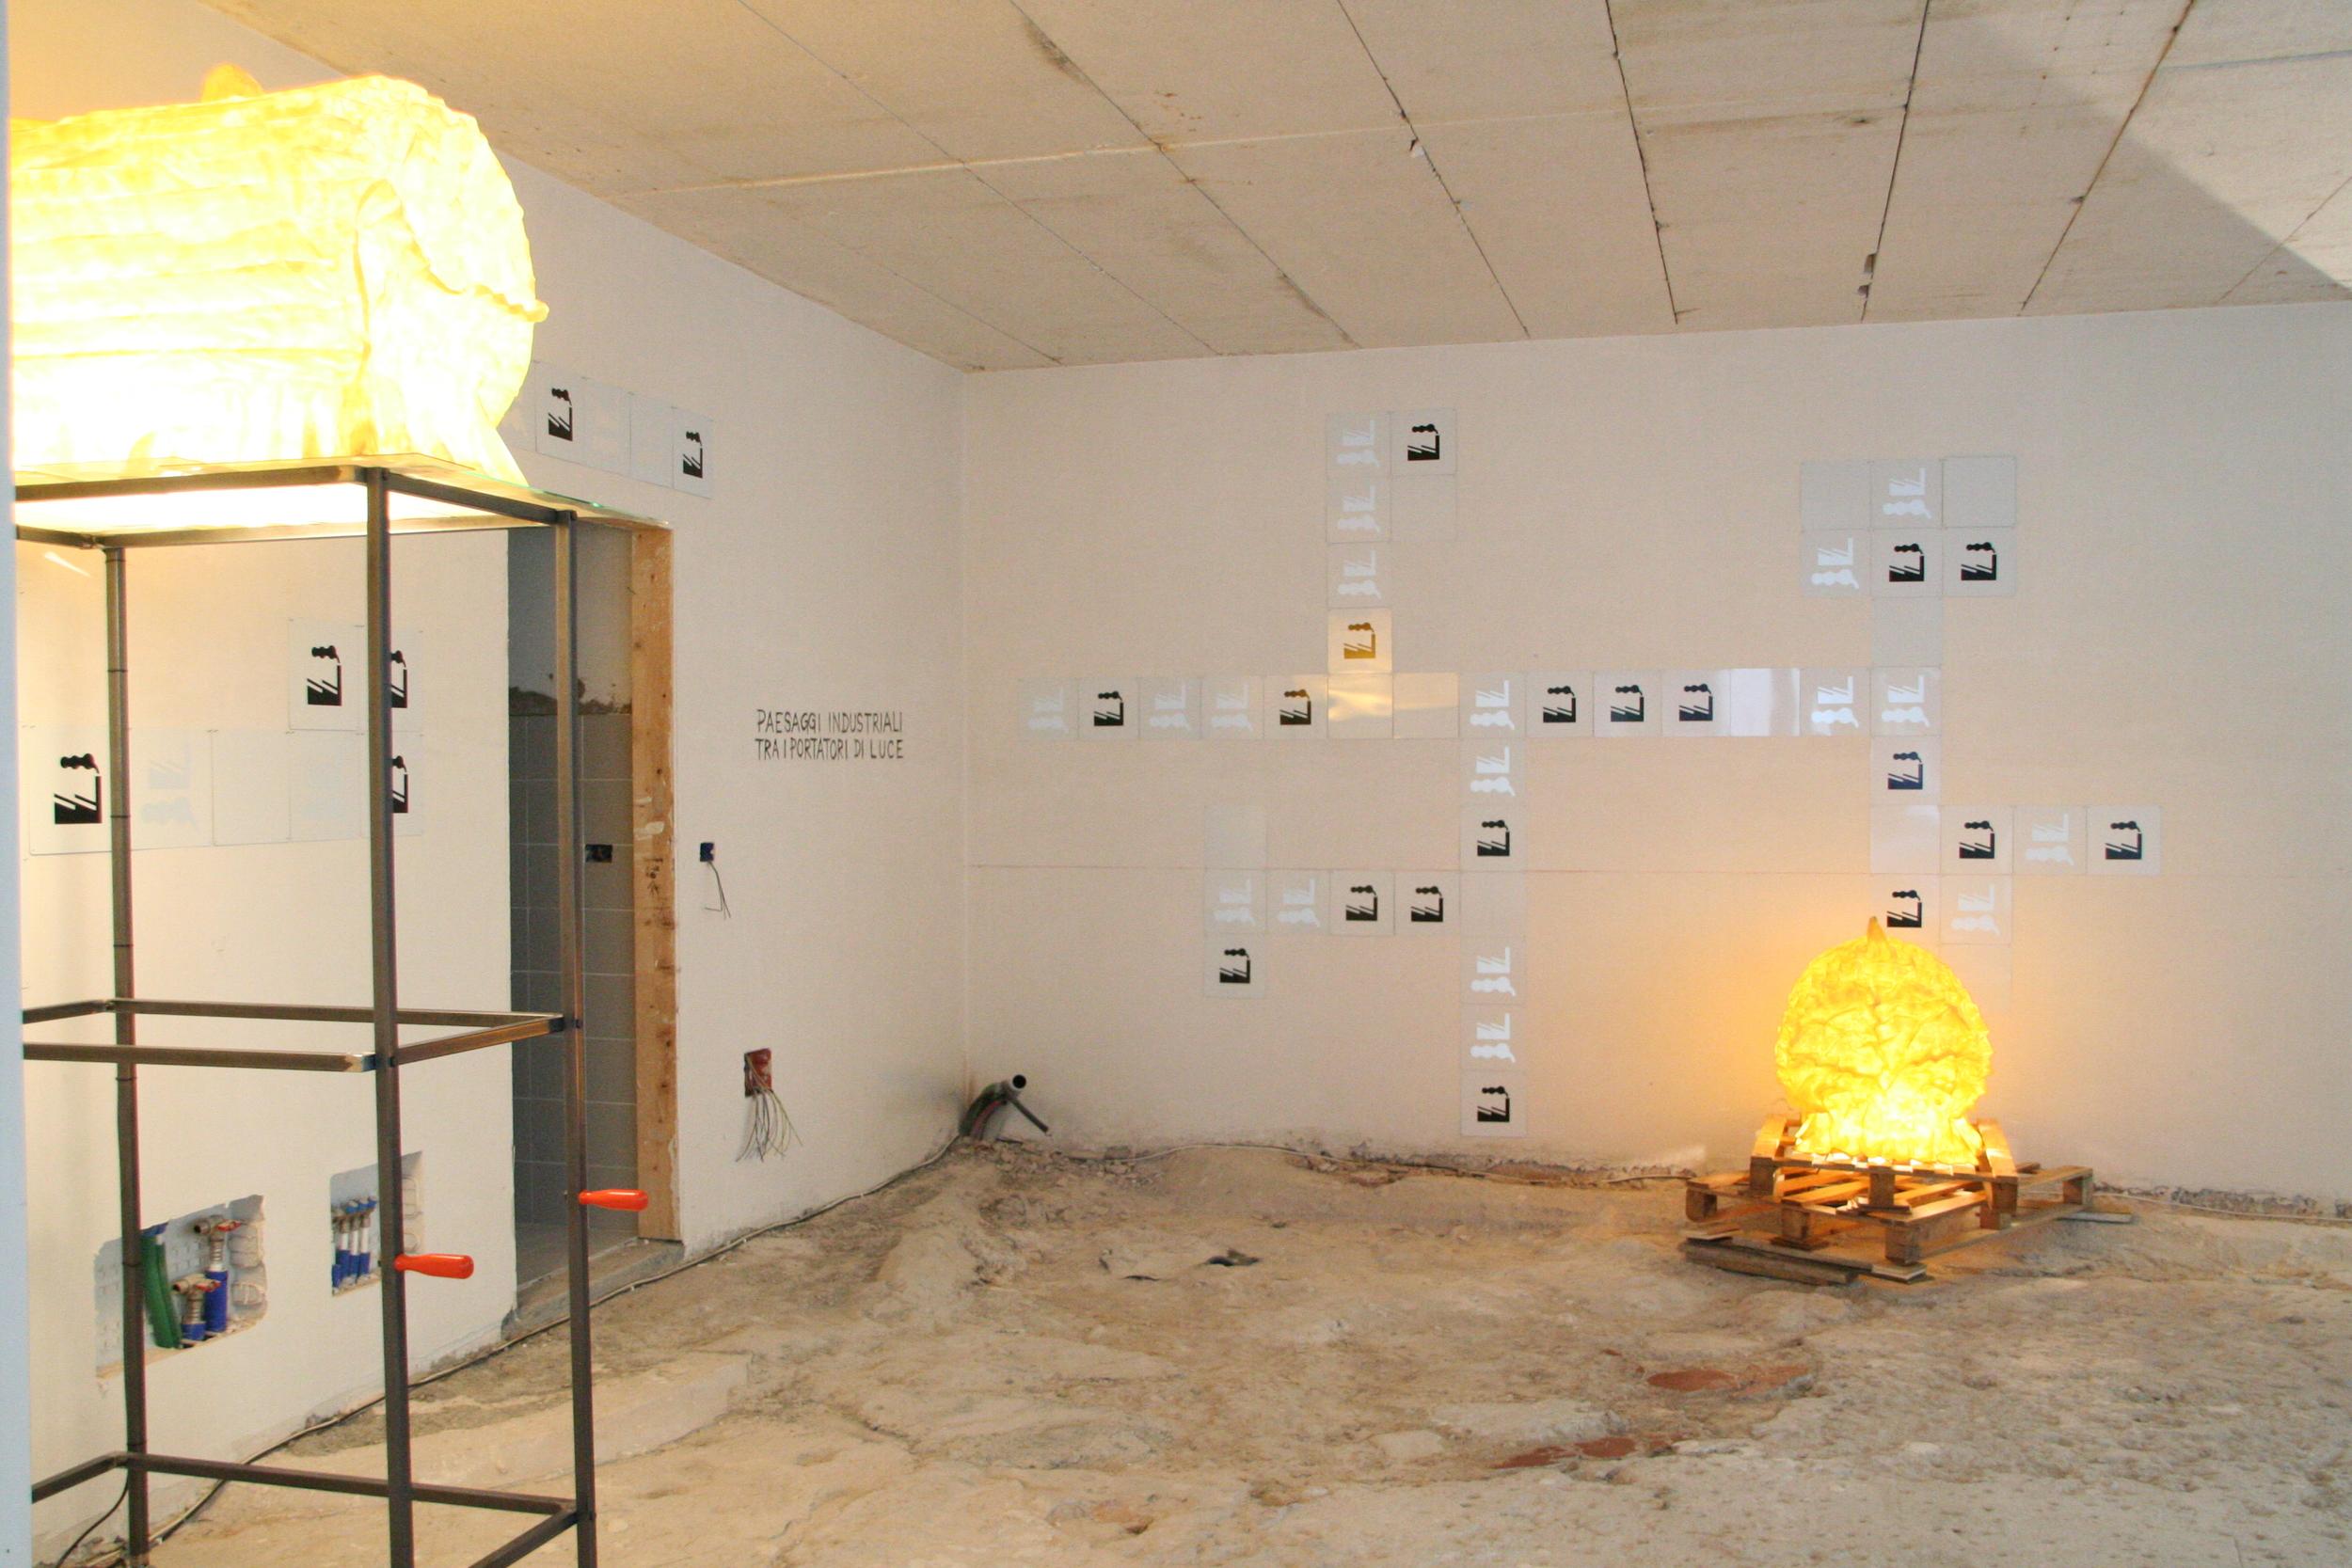 Pivotto L. - Paesaggi industriali tra i portatori di luce.JPG